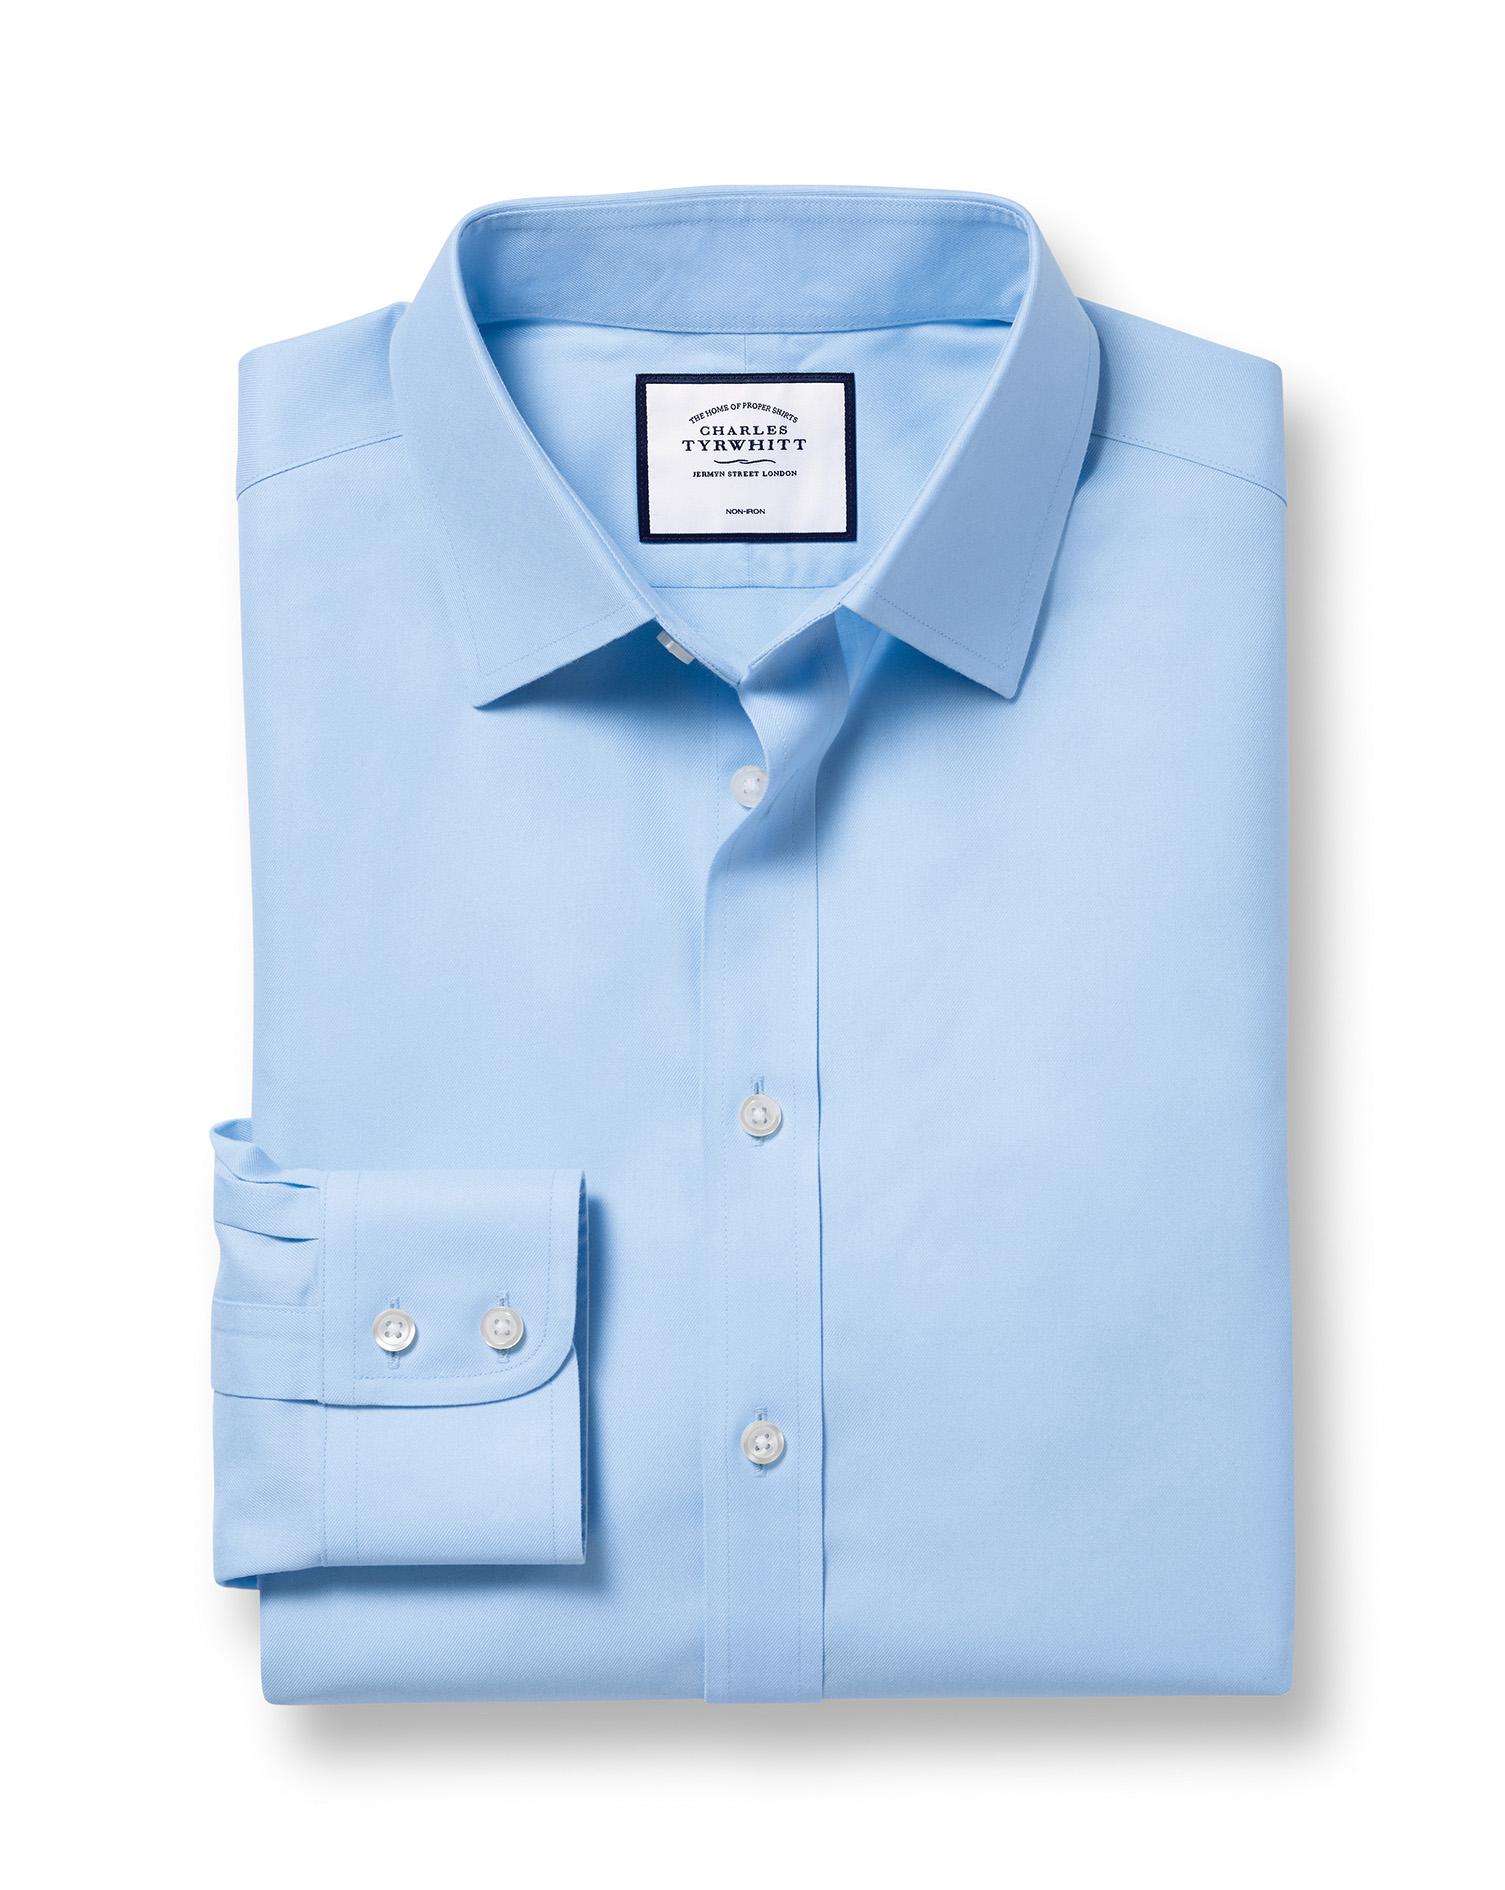 Cotton Extra Slim Fit Sky Blue Non-Iron Twill Shirt